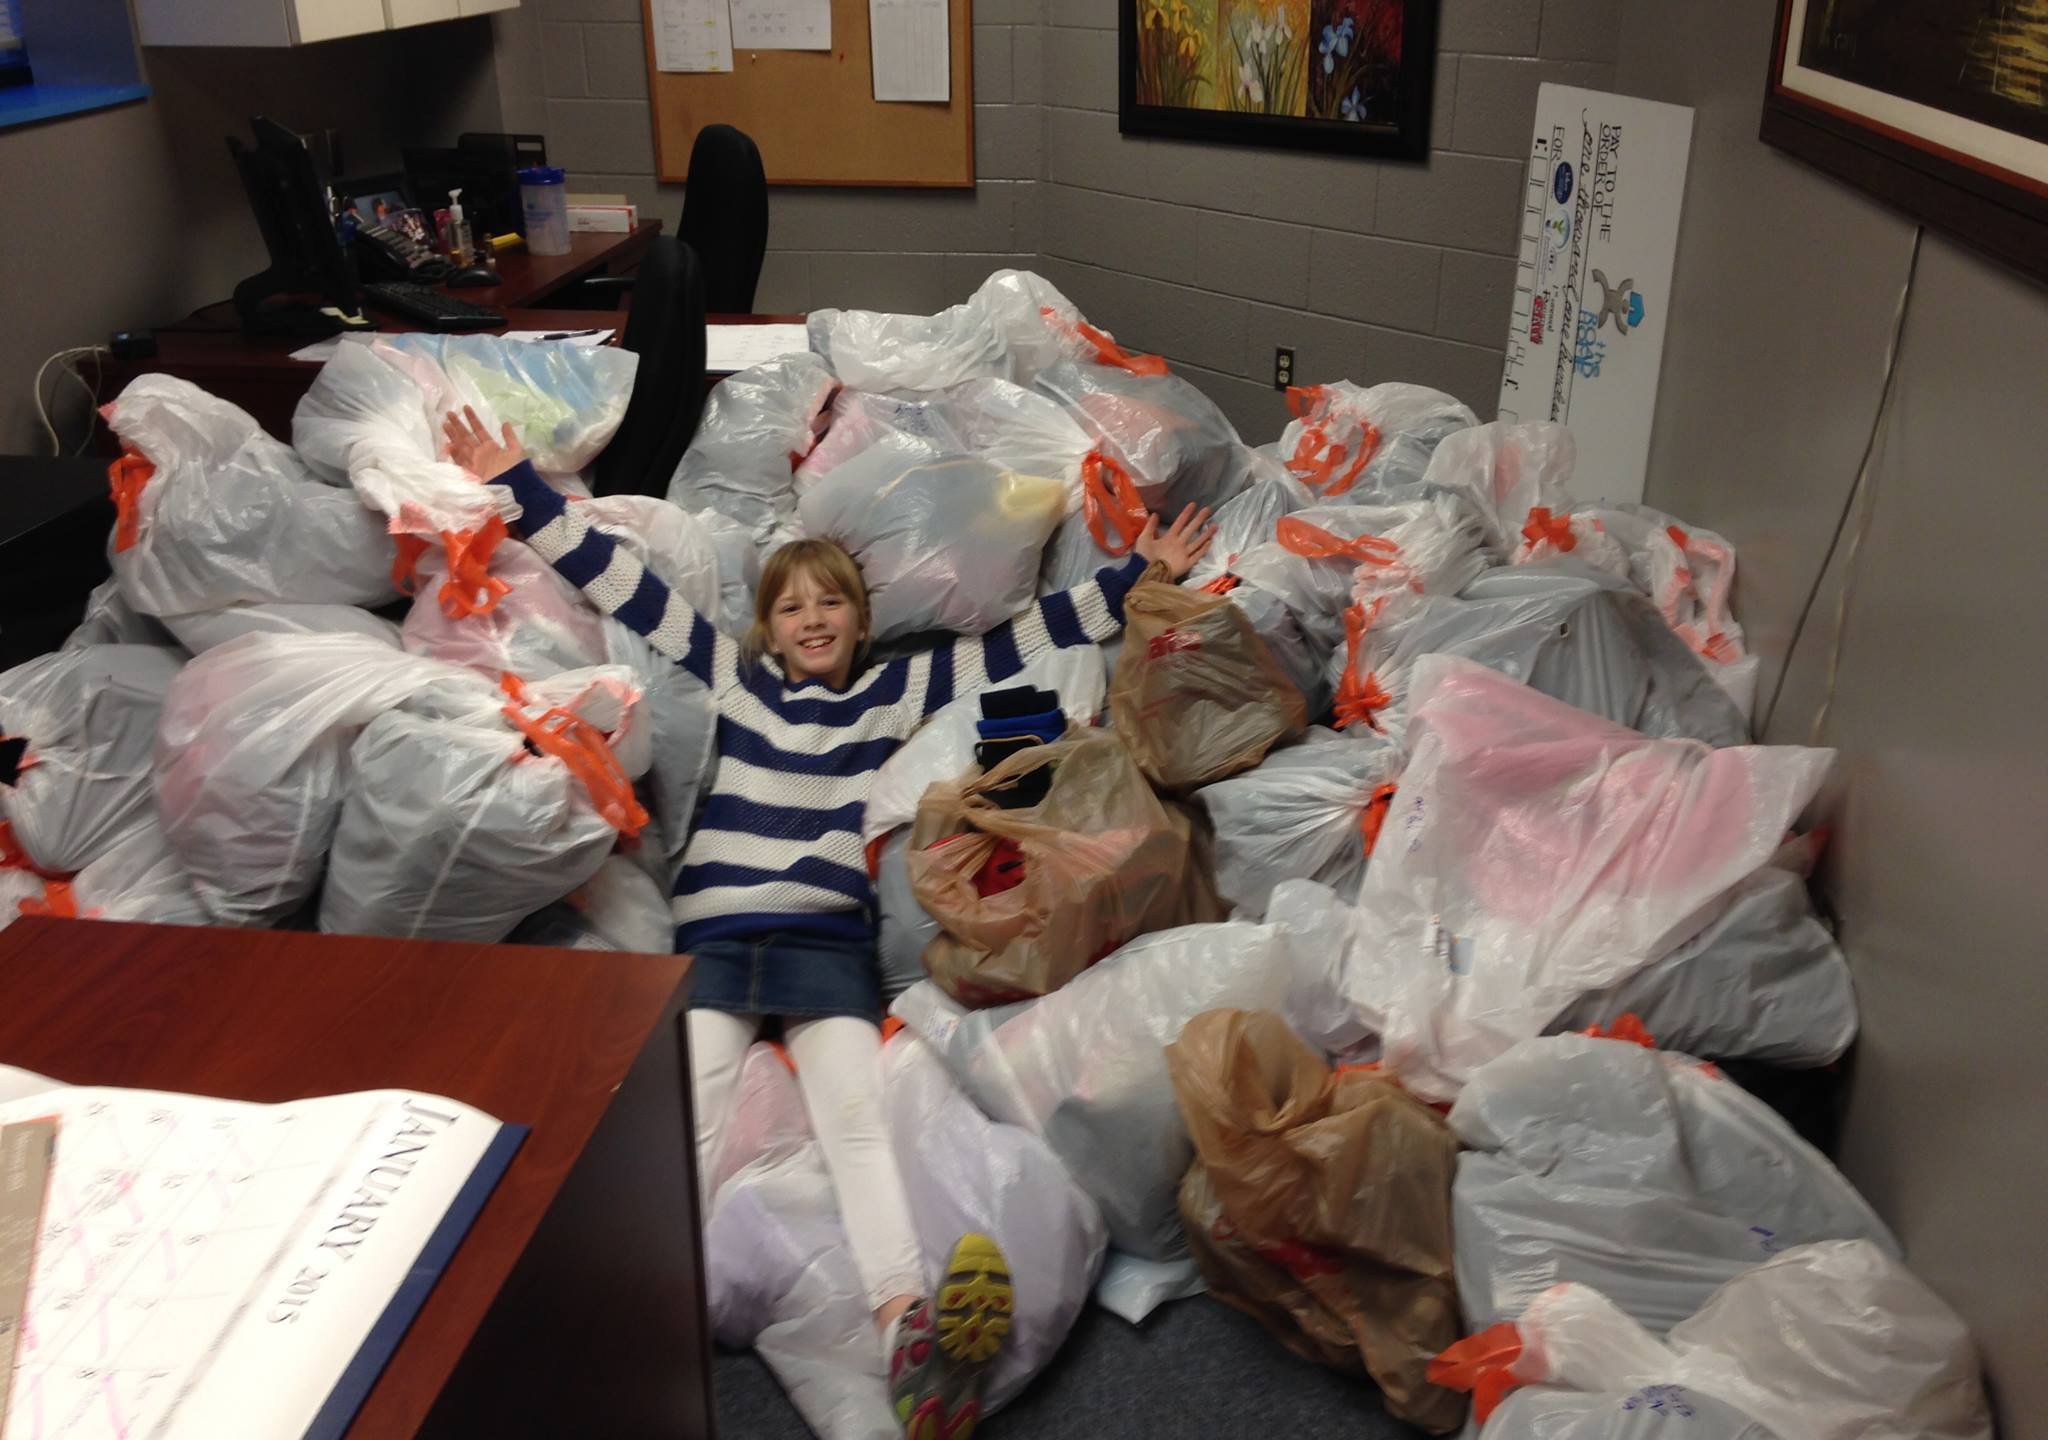 Alia Leonard Donating Backpacks and Gifts to Children